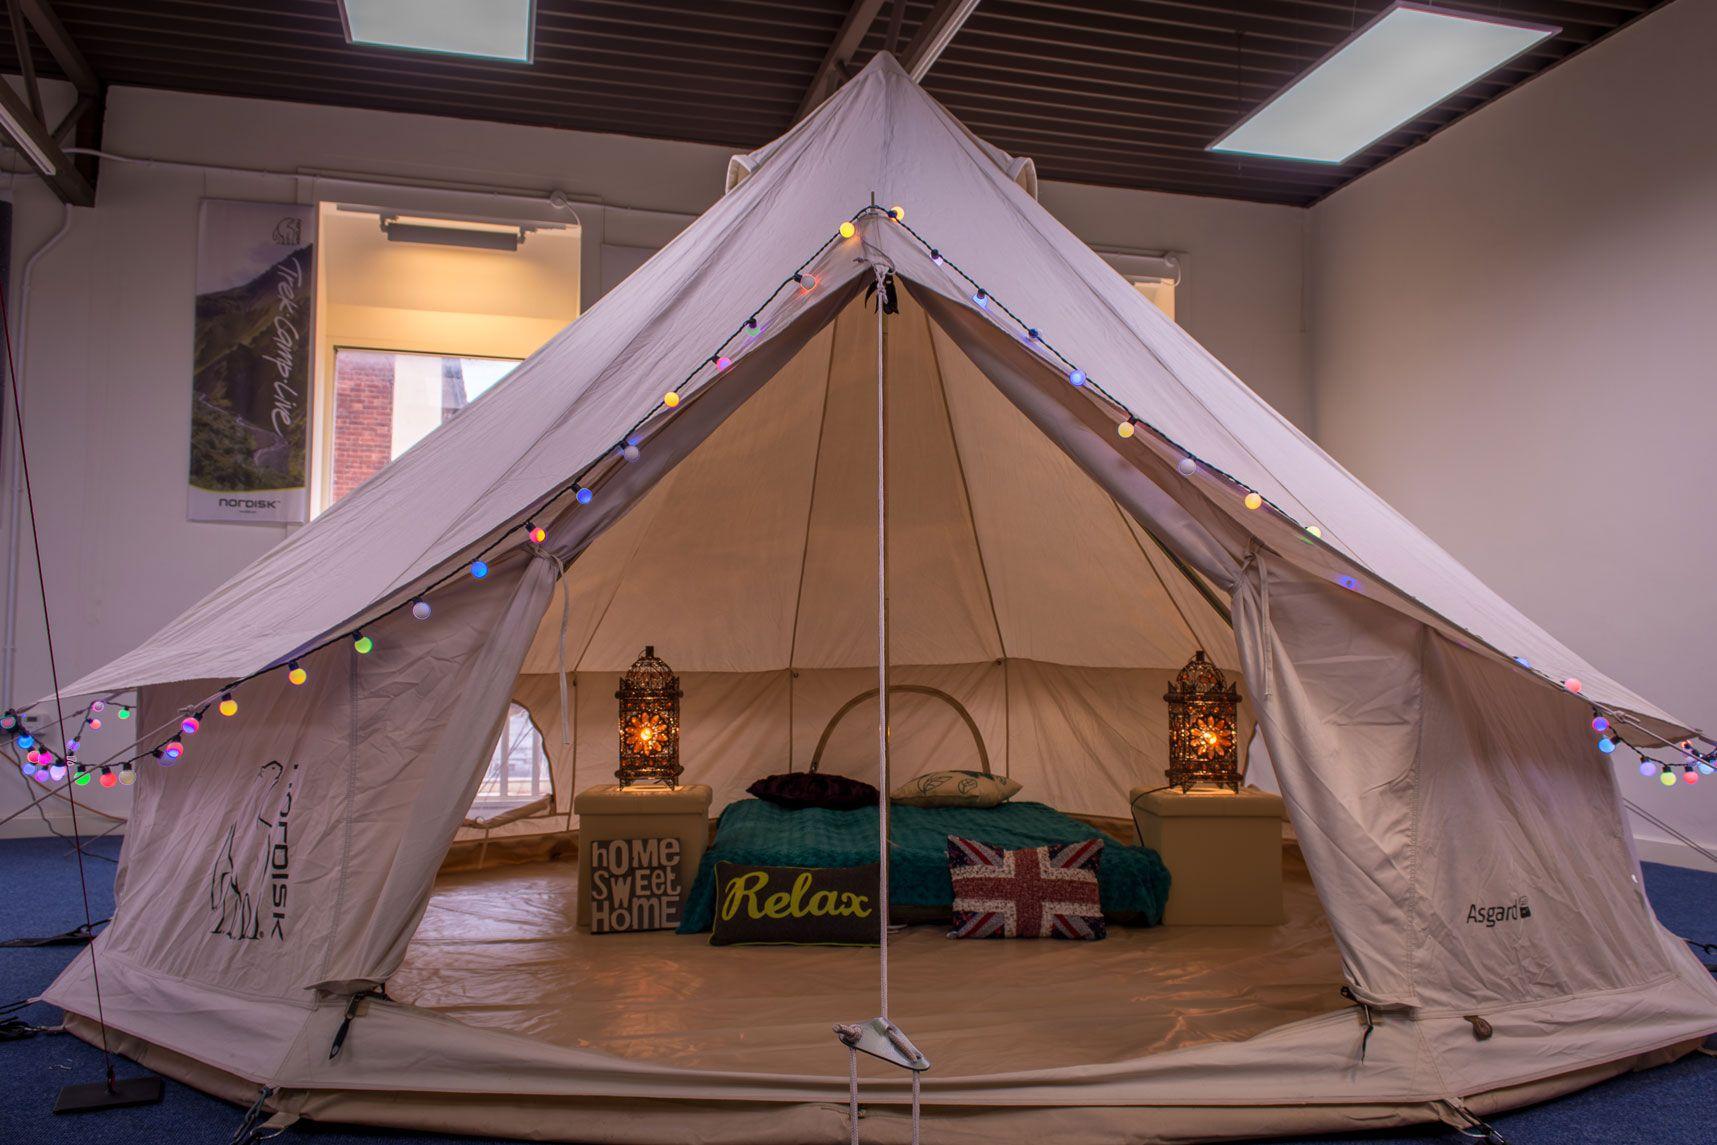 Nordisk Asgard 12.6 | Tent glamping, Tent, Market tent